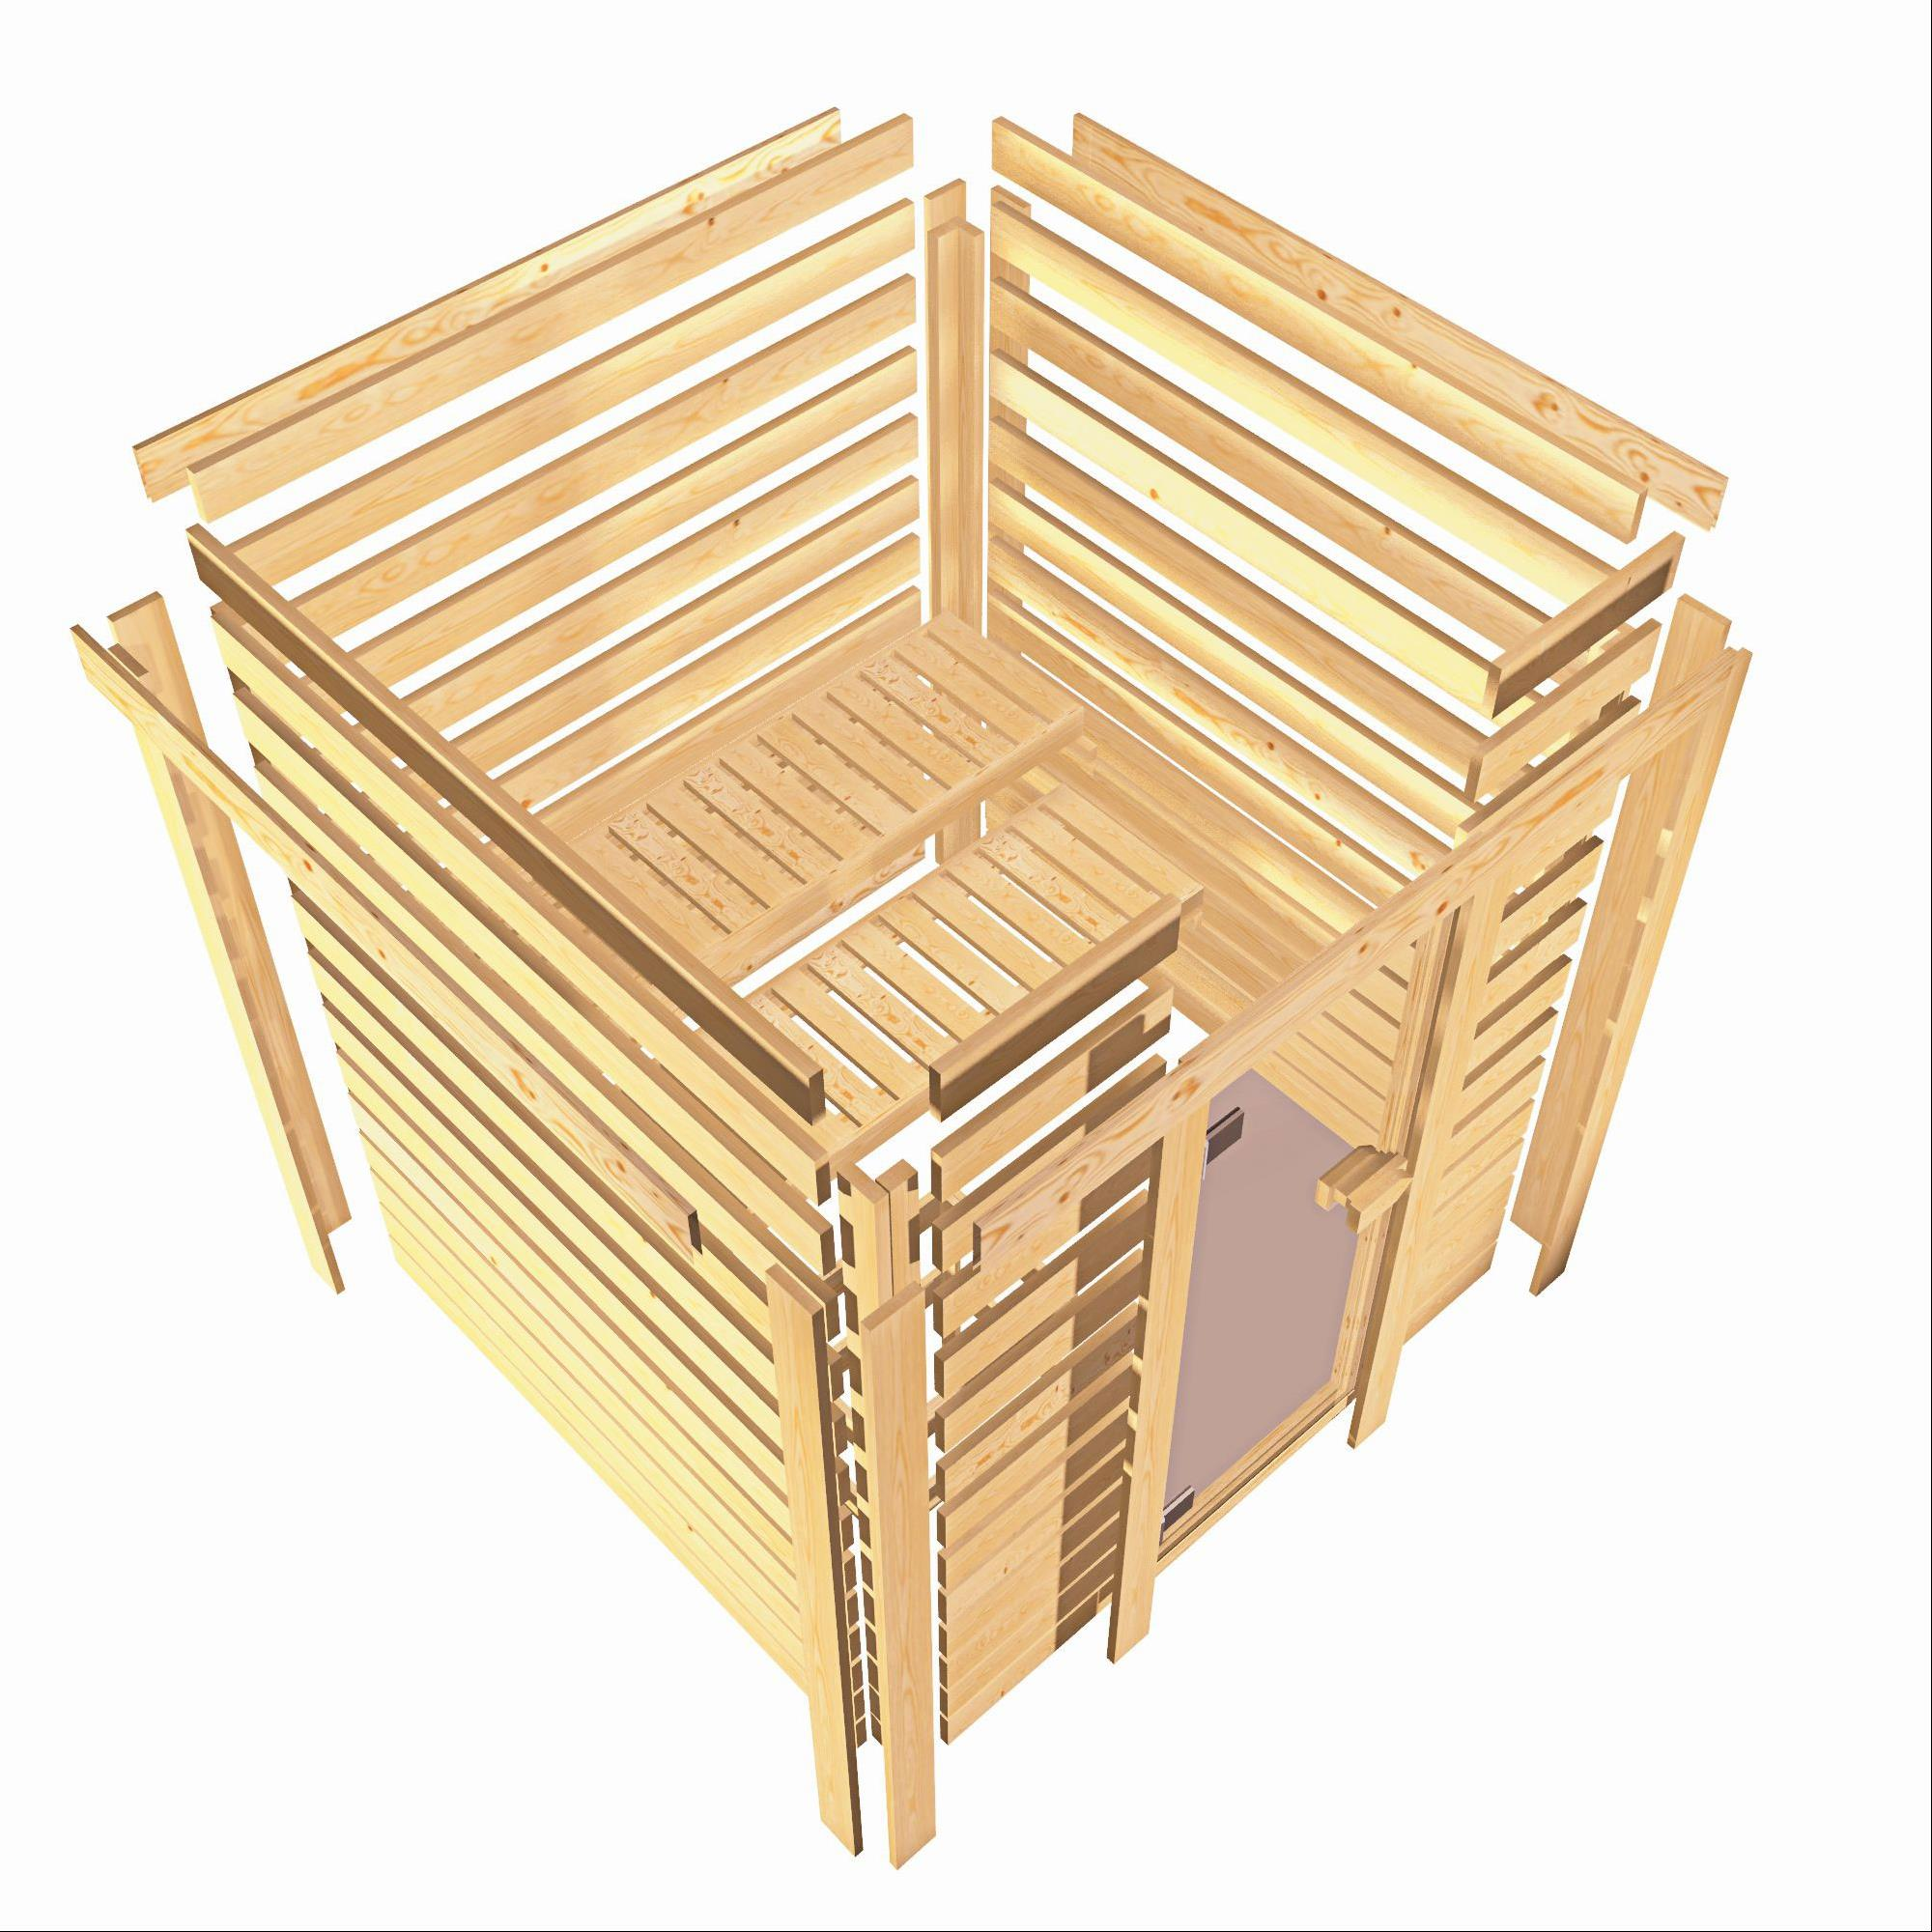 Woodfeeling Sauna Karla 38mm Kranz Ofen 9kW extern Tür modern Bild 4